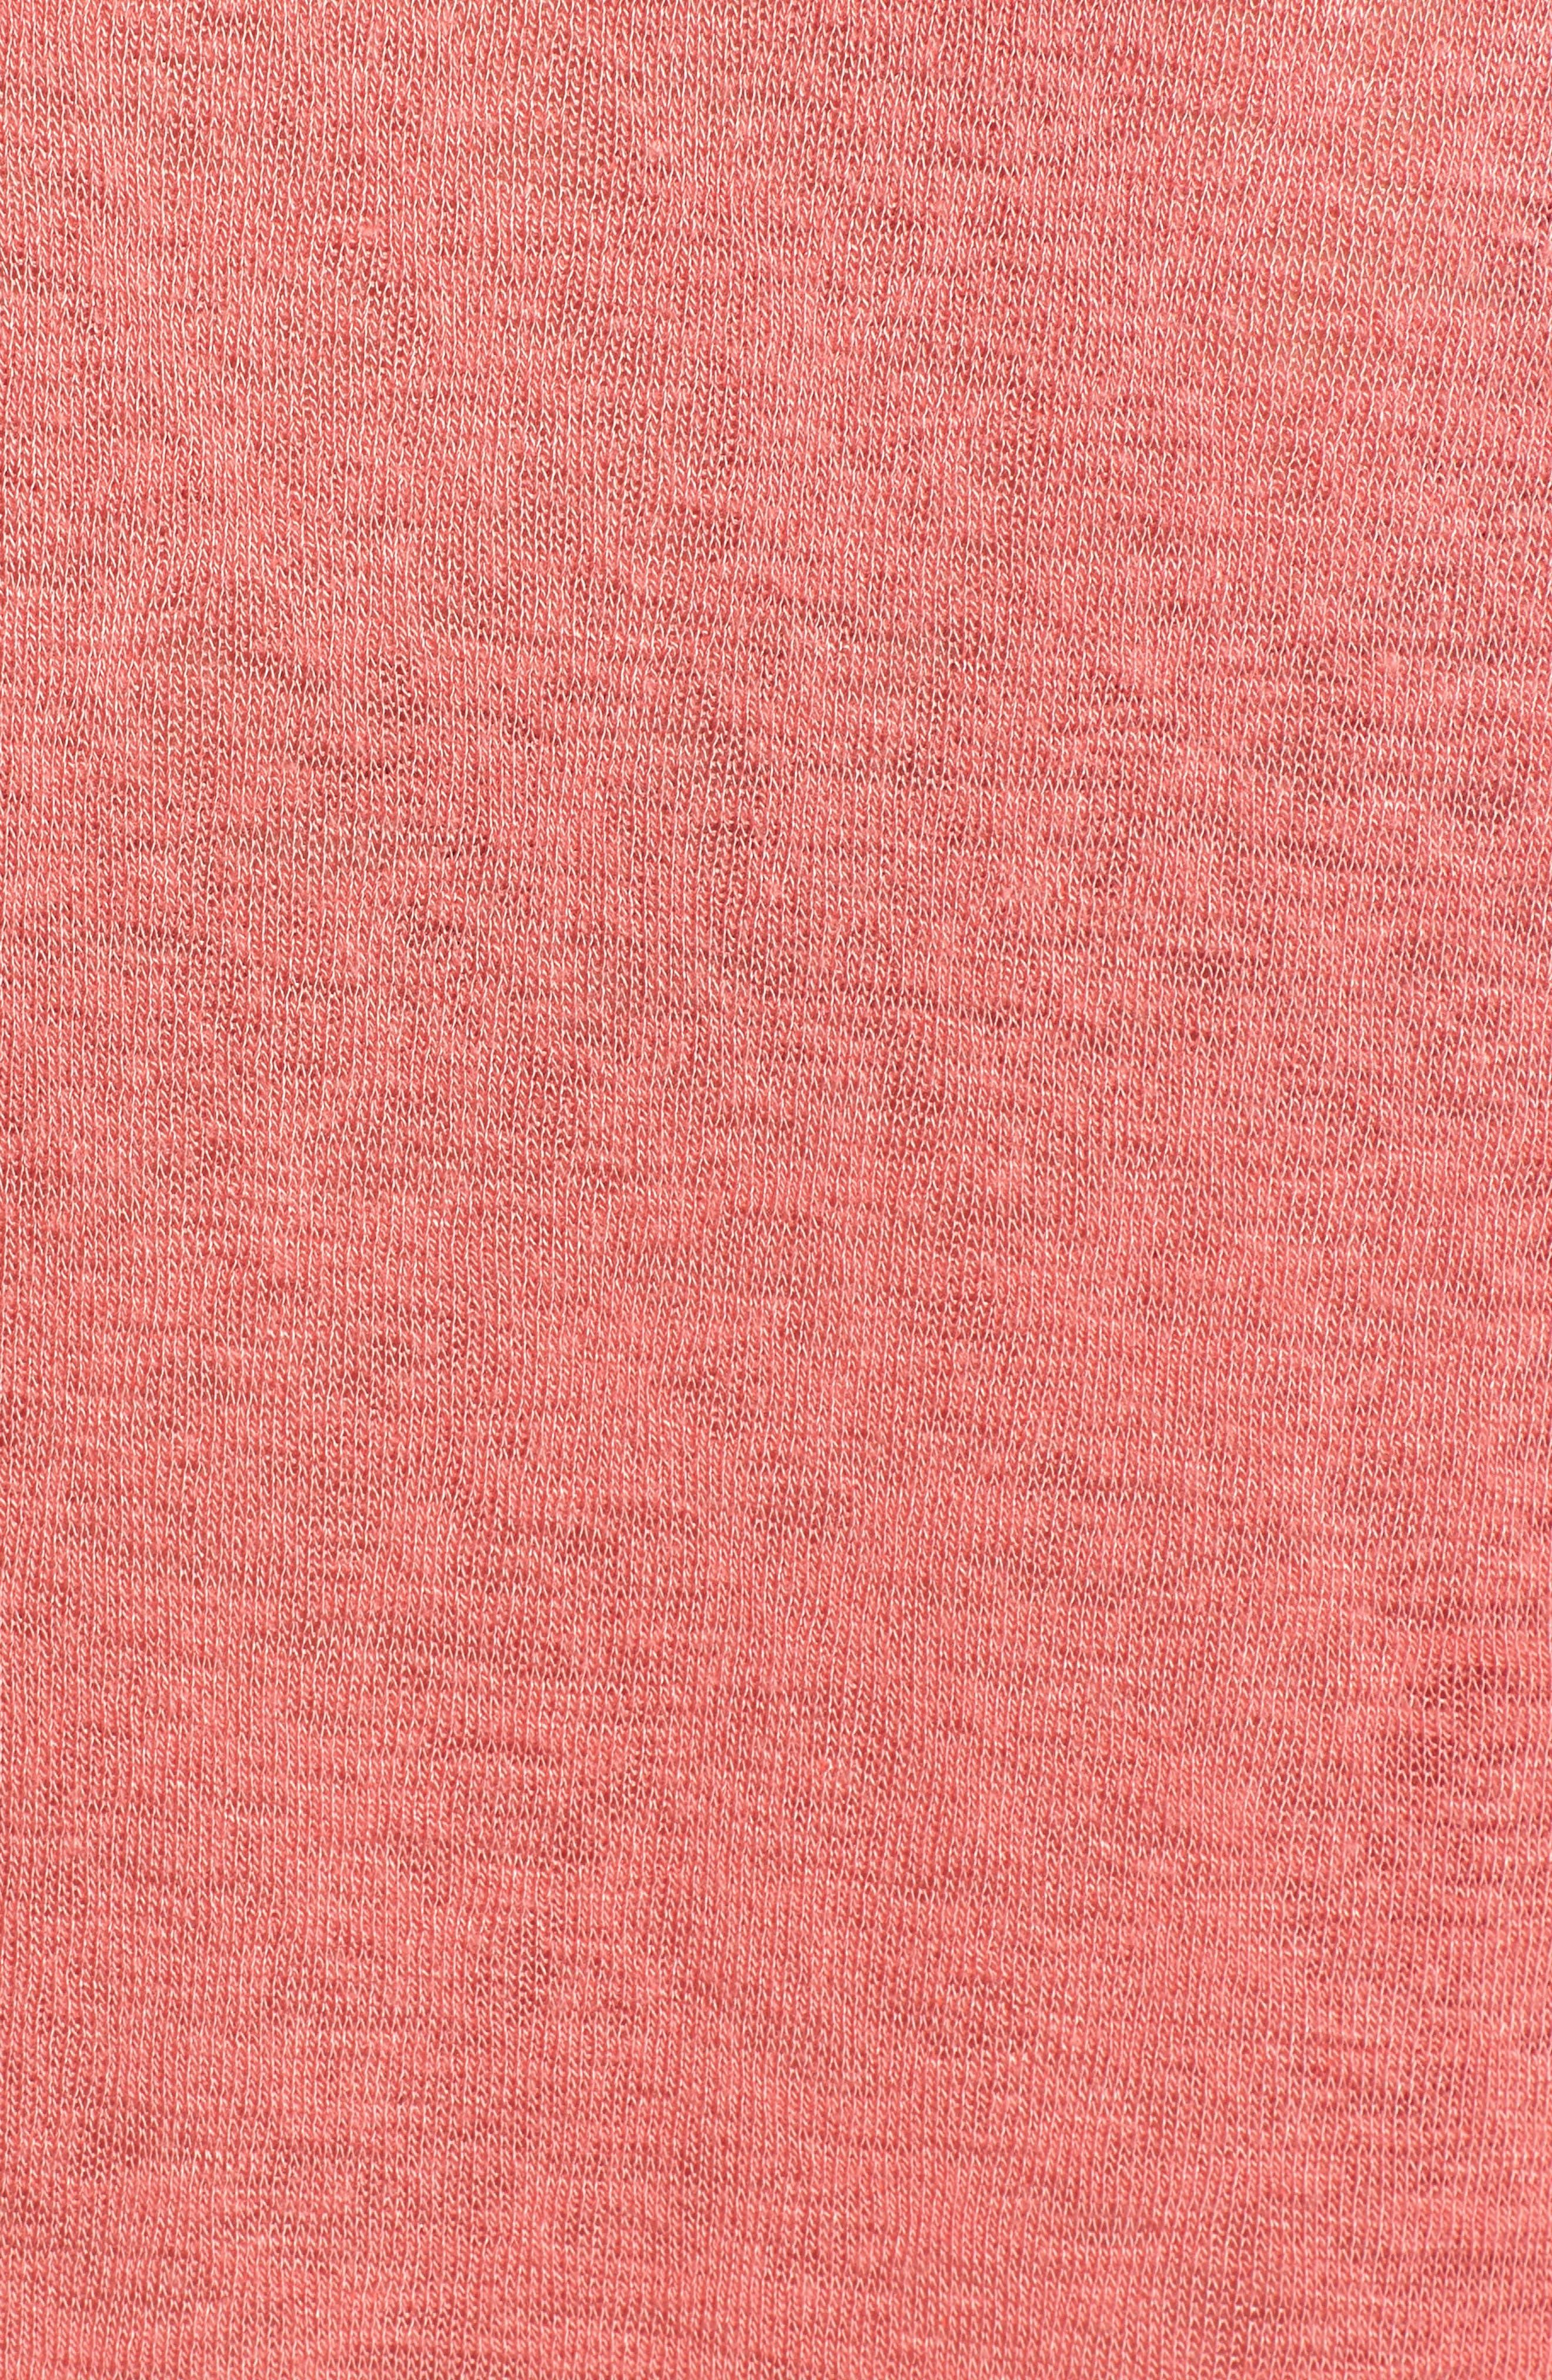 Tuck Sleeve Sweatshirt,                             Alternate thumbnail 6, color,                             Coral Rose